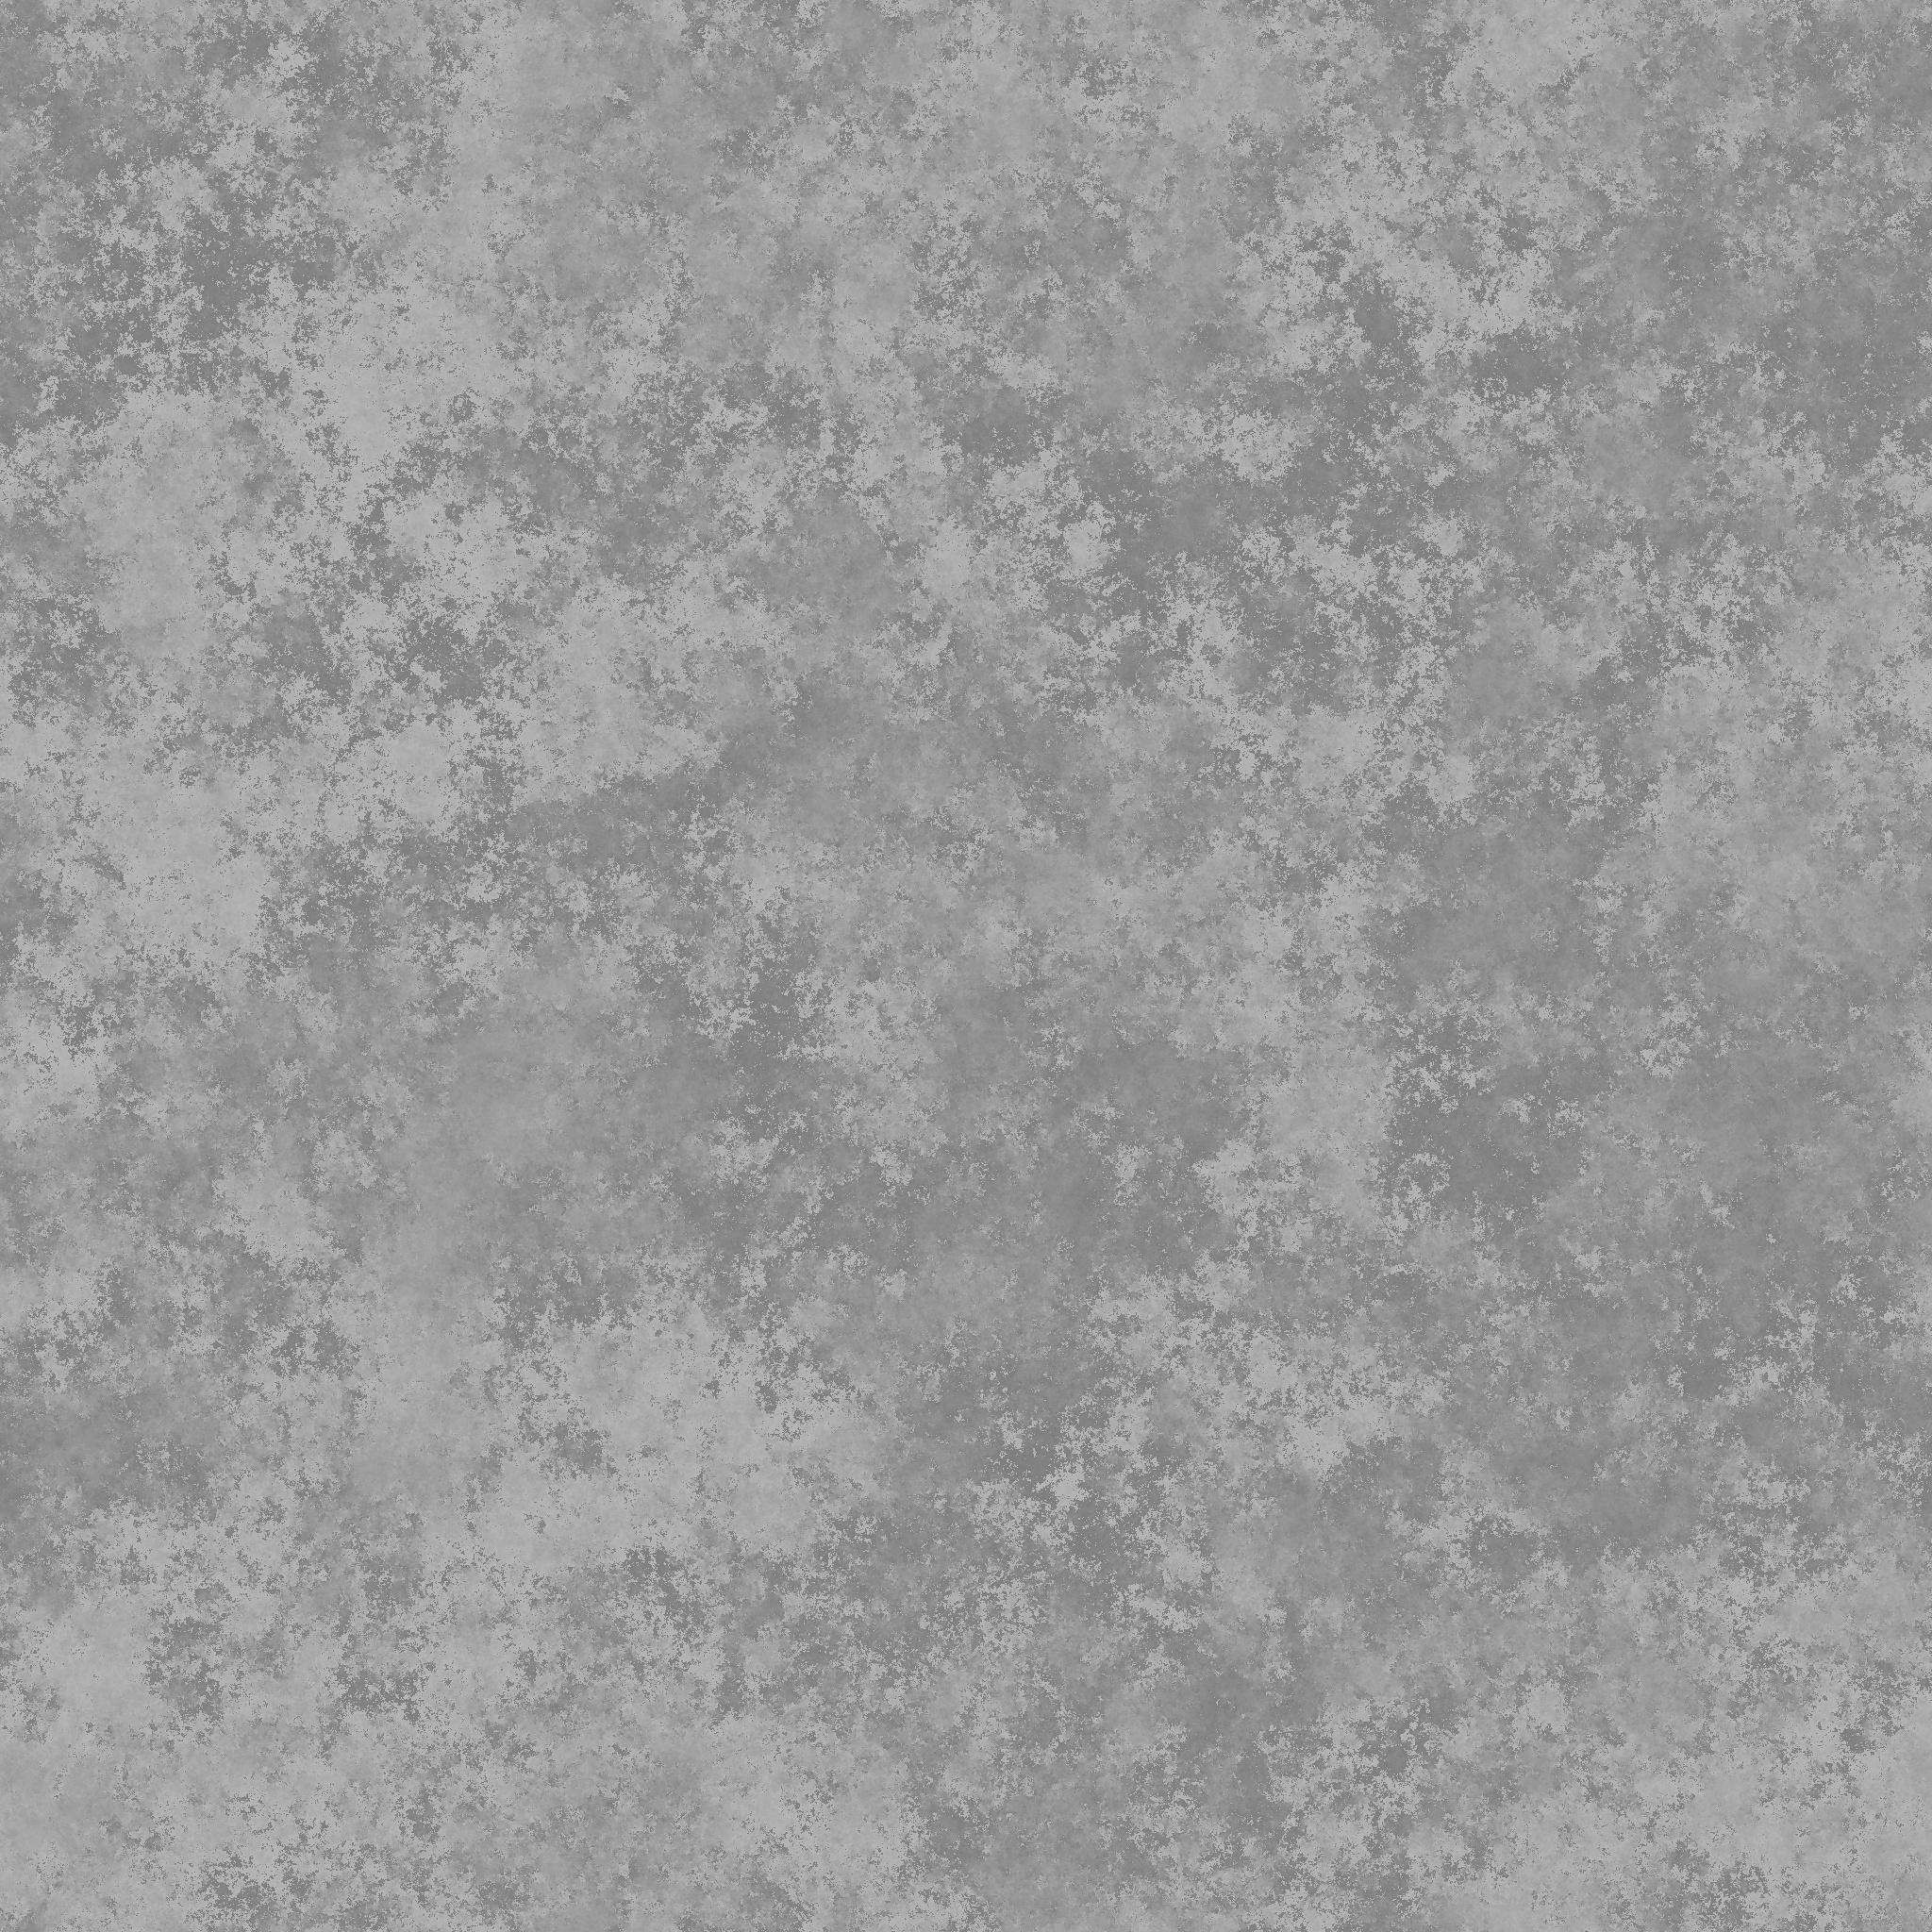 Update 2] +20 MF Noise (T) - 500 HD Textures Vol 1 by Kronbits